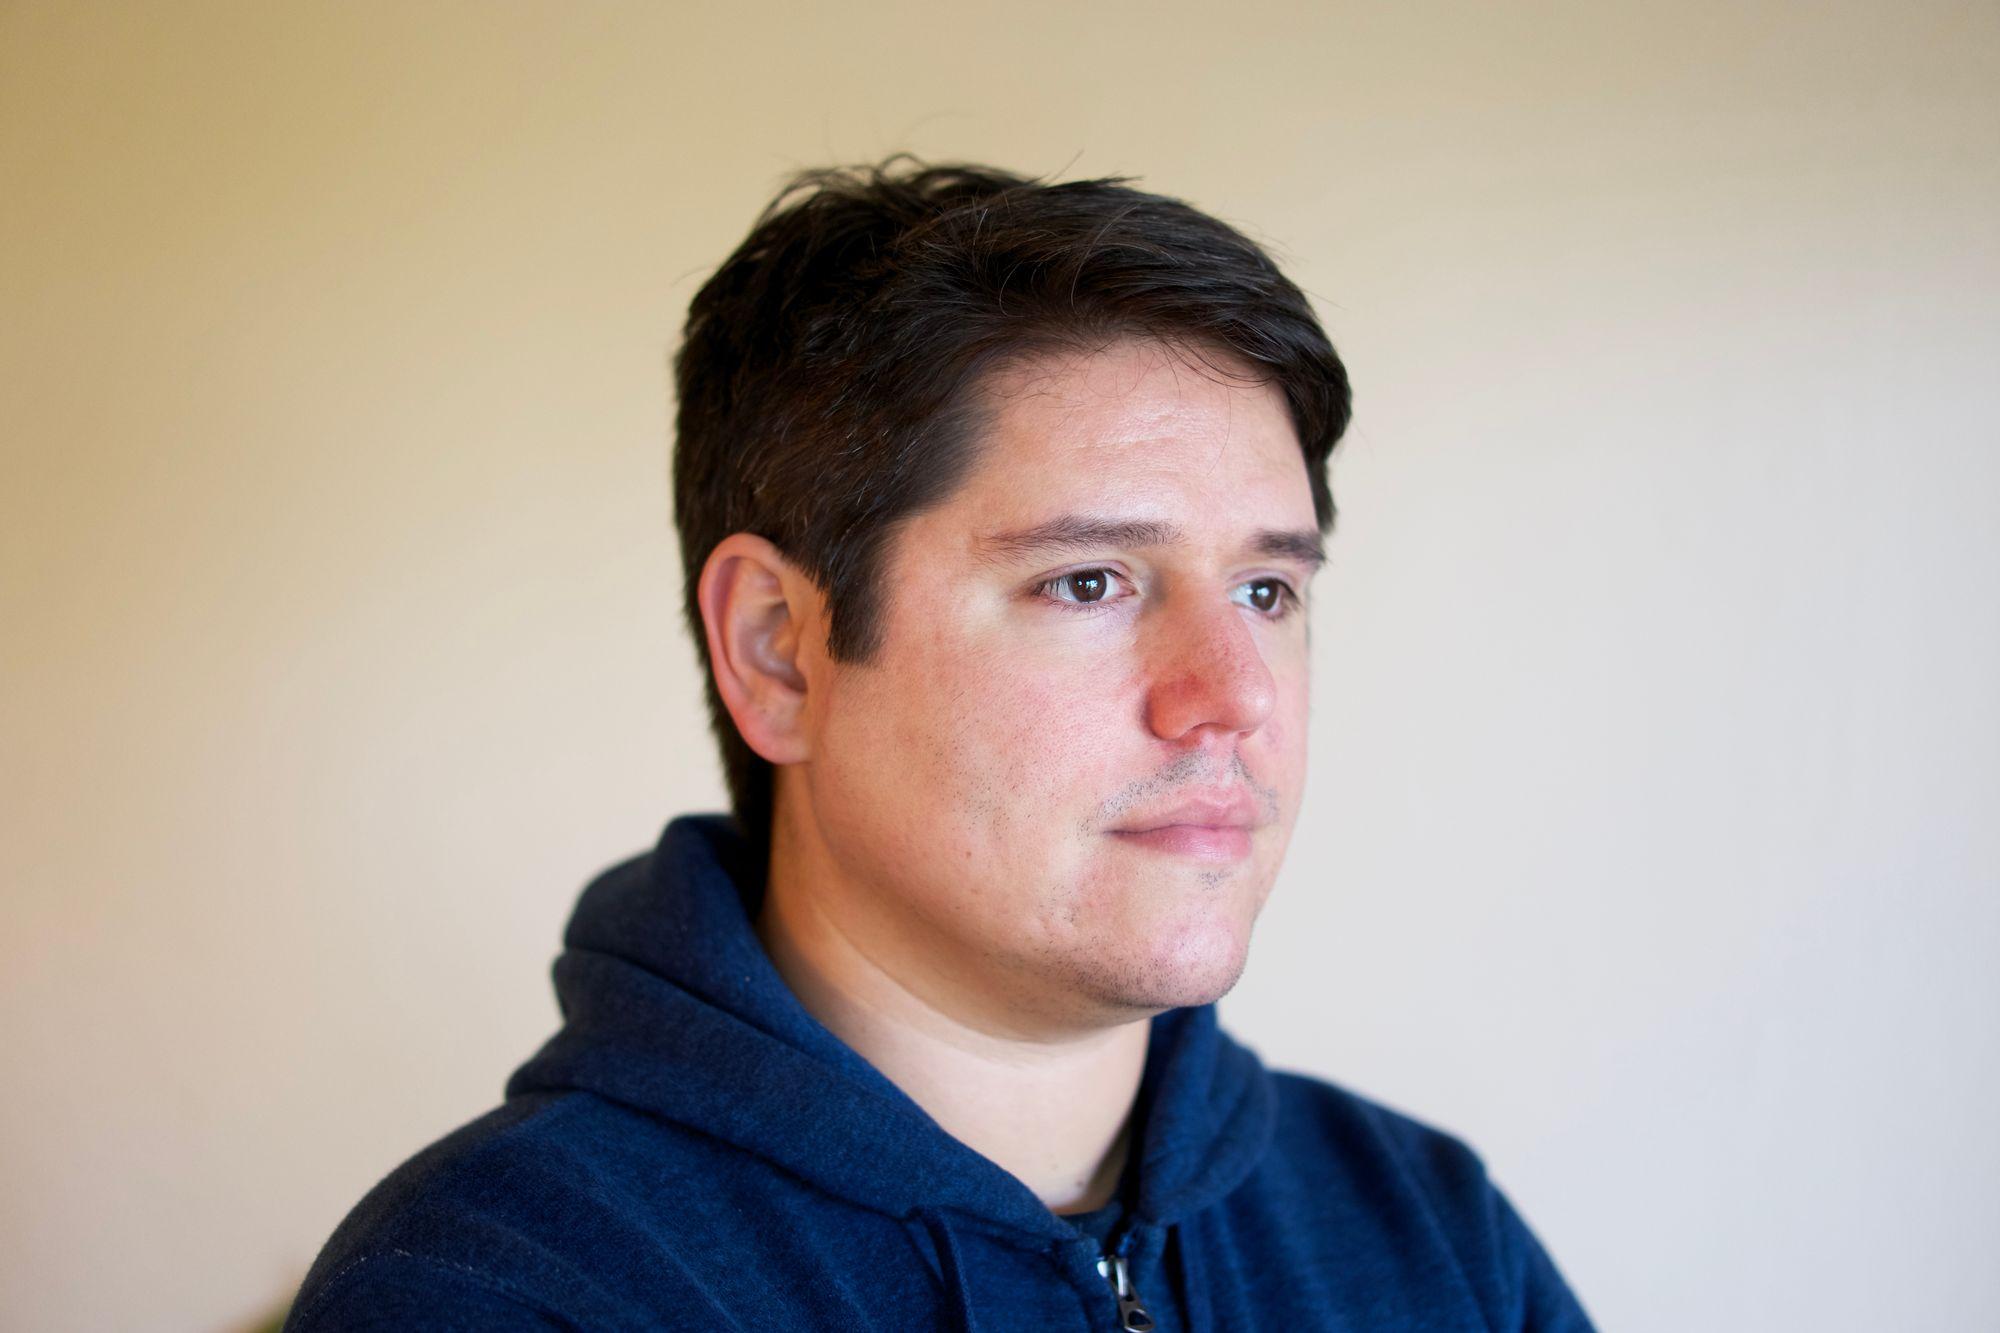 Daniel Valdivia